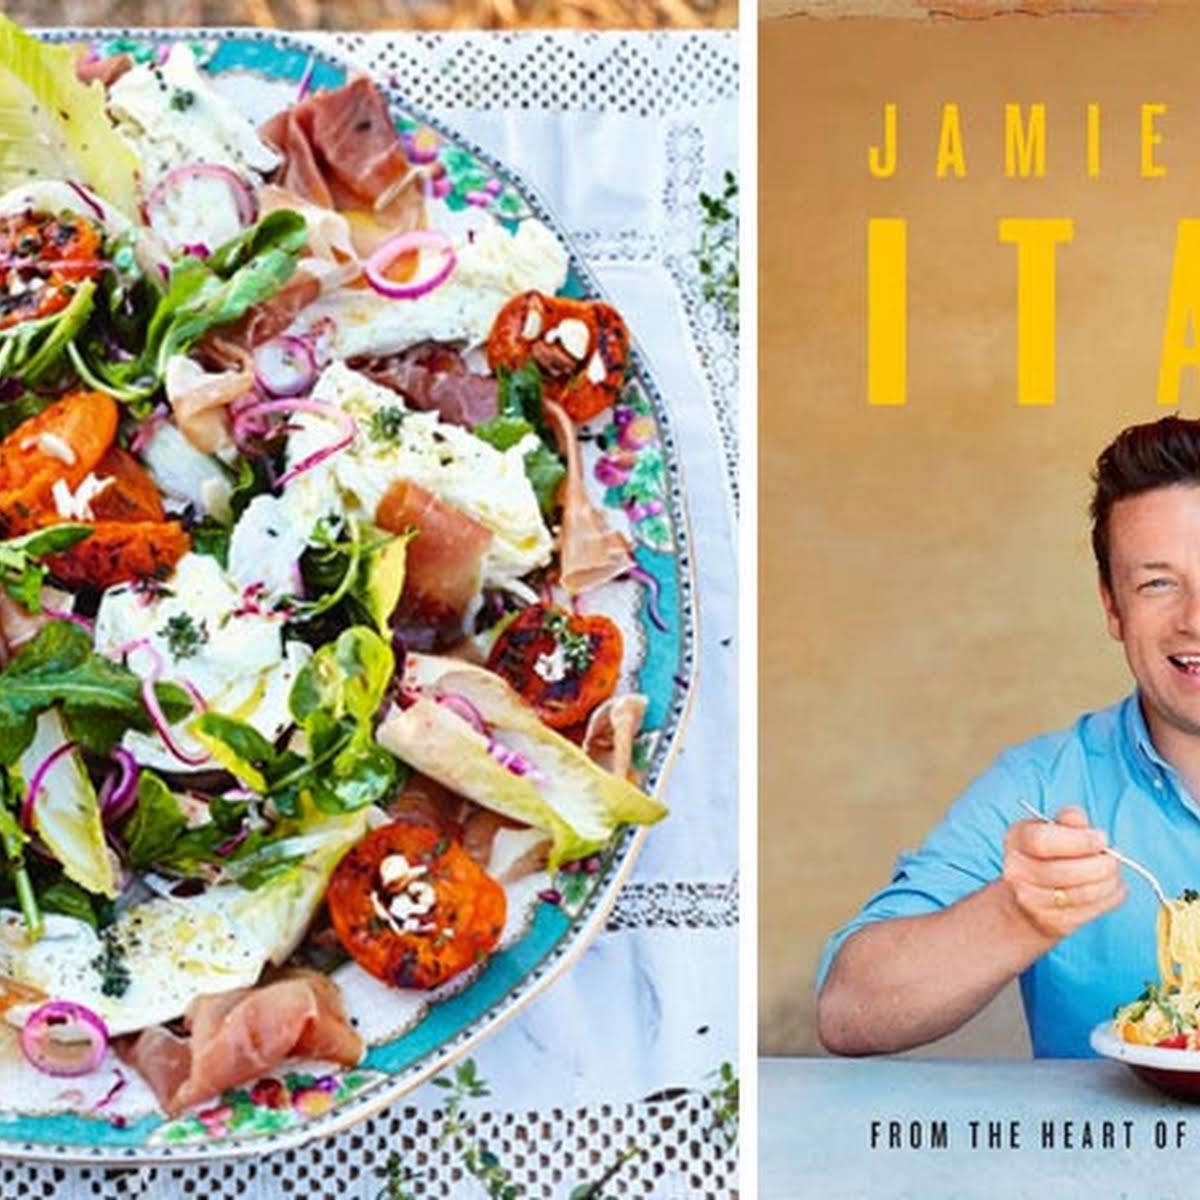 Jamie Olivers Grilled Apricot Salad